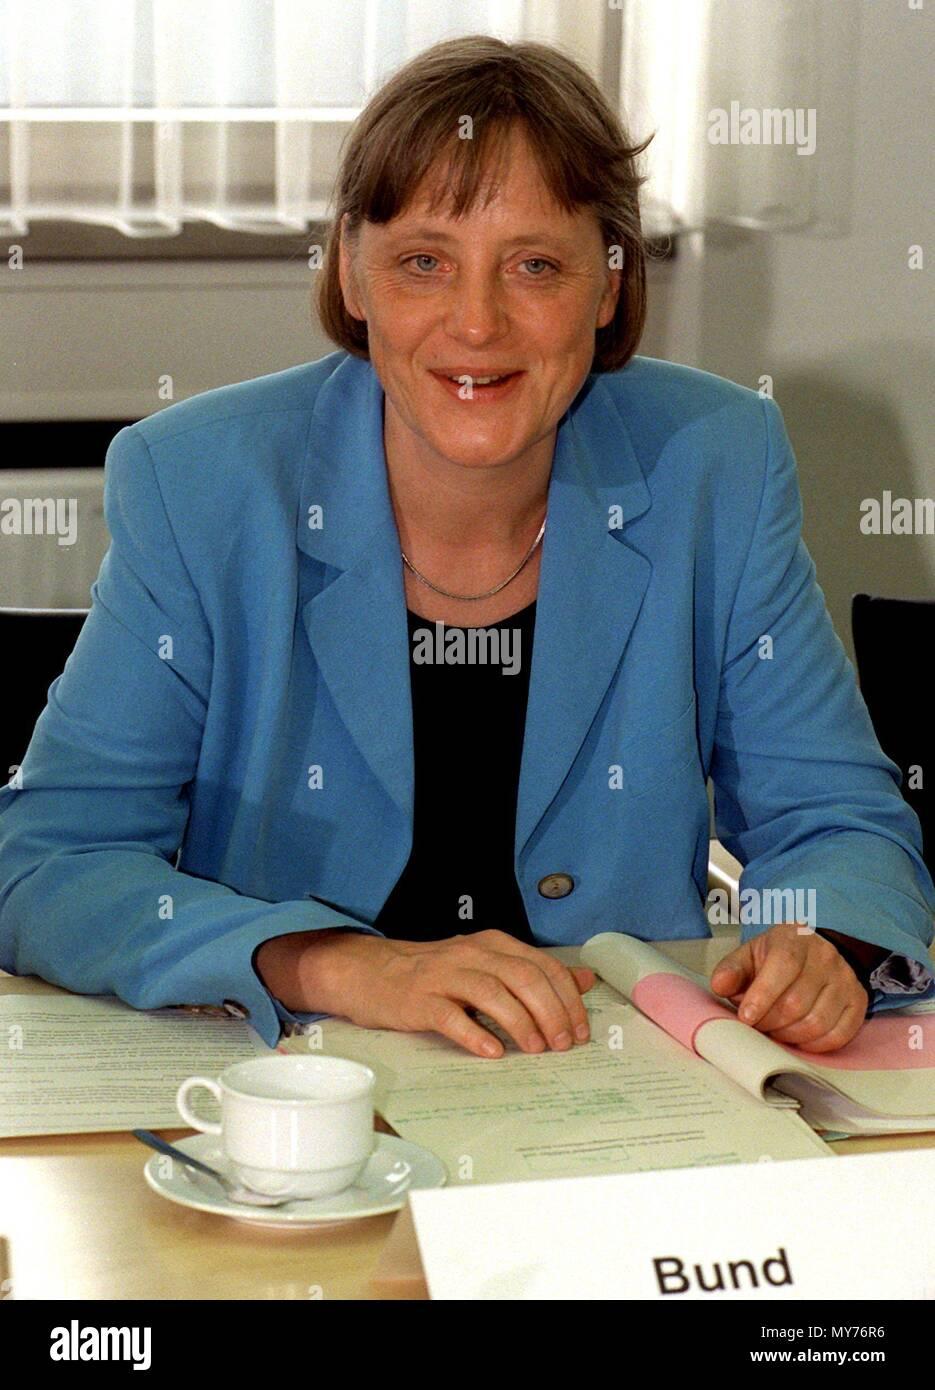 Bundesumweltministerium Bonn